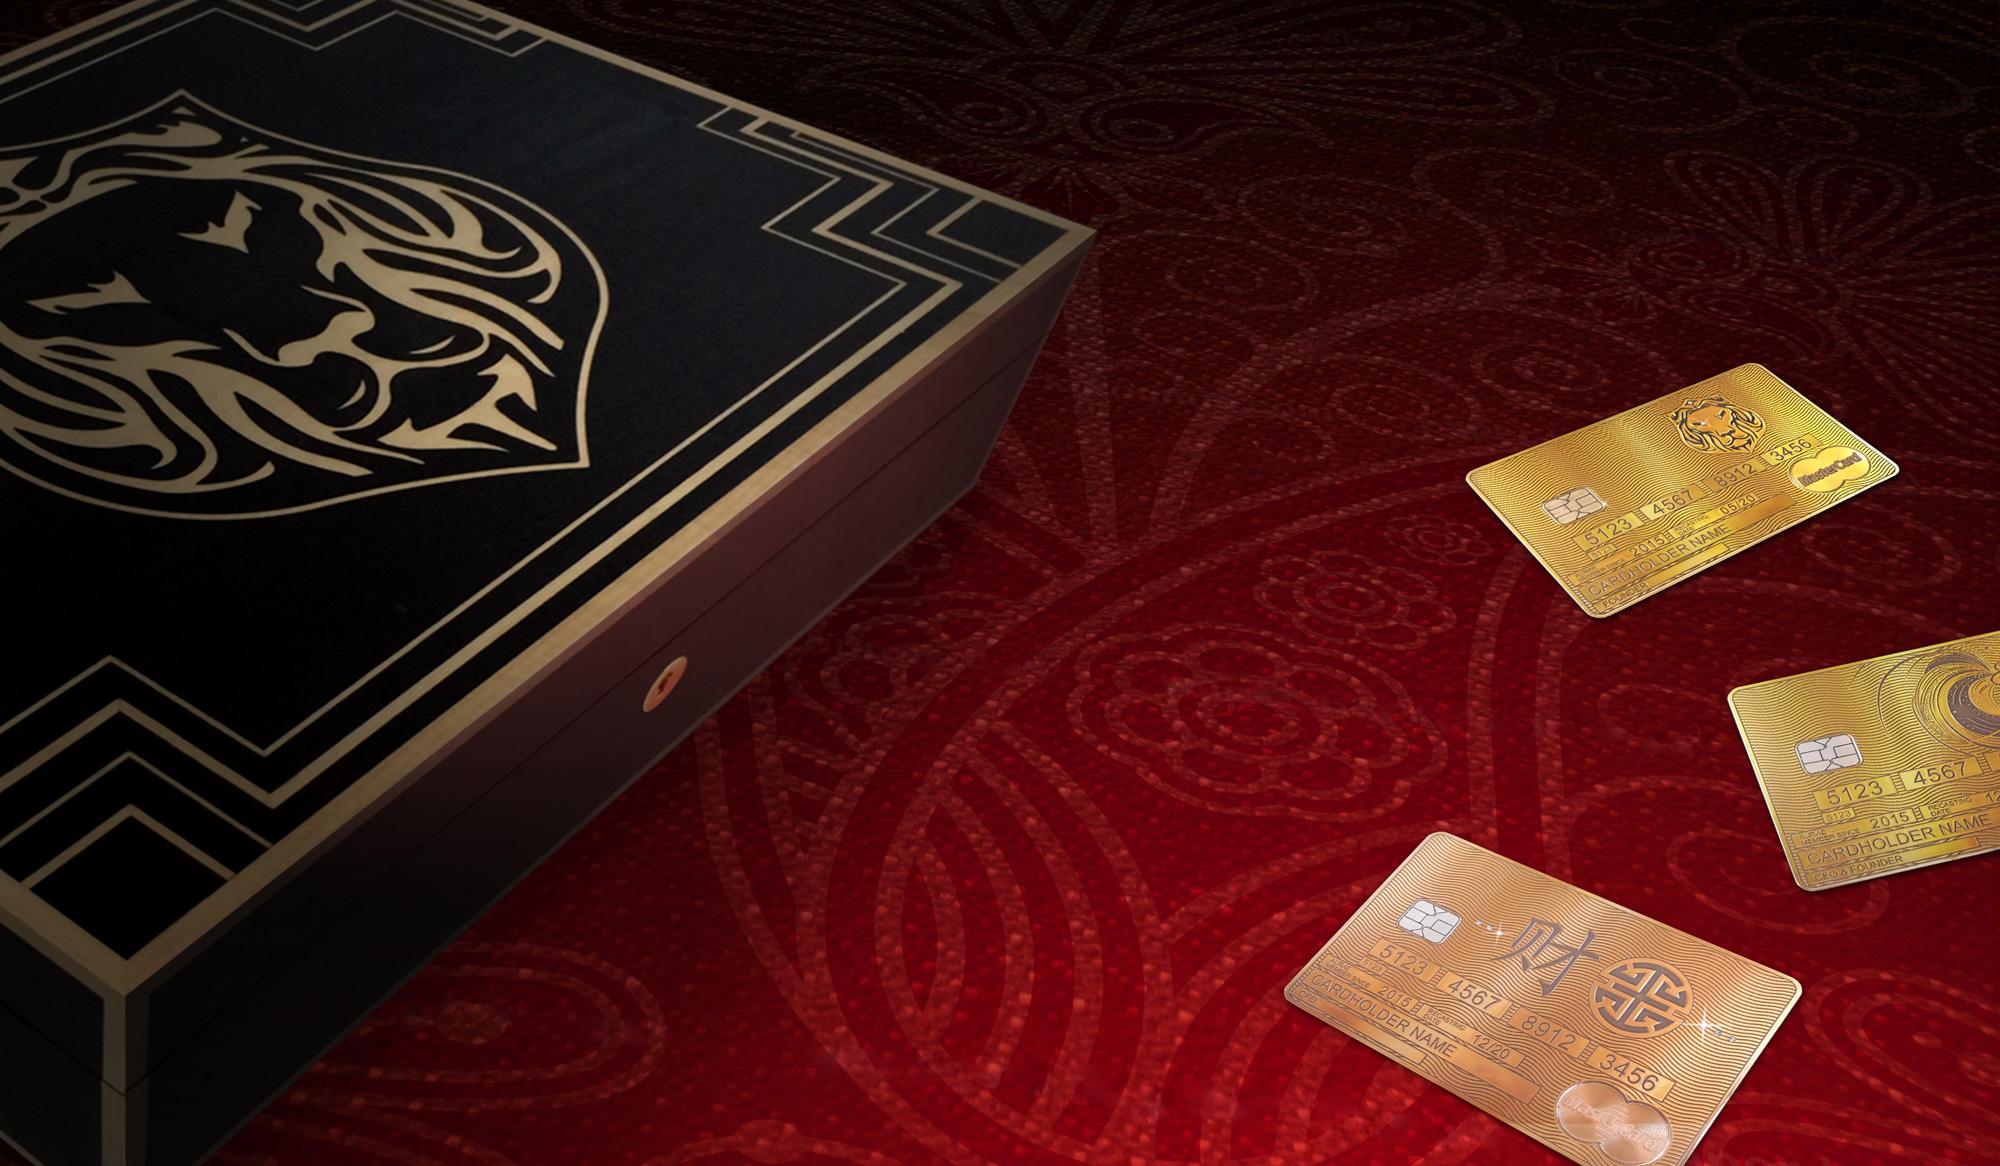 The Aurae Lifestyle gold MasterCard